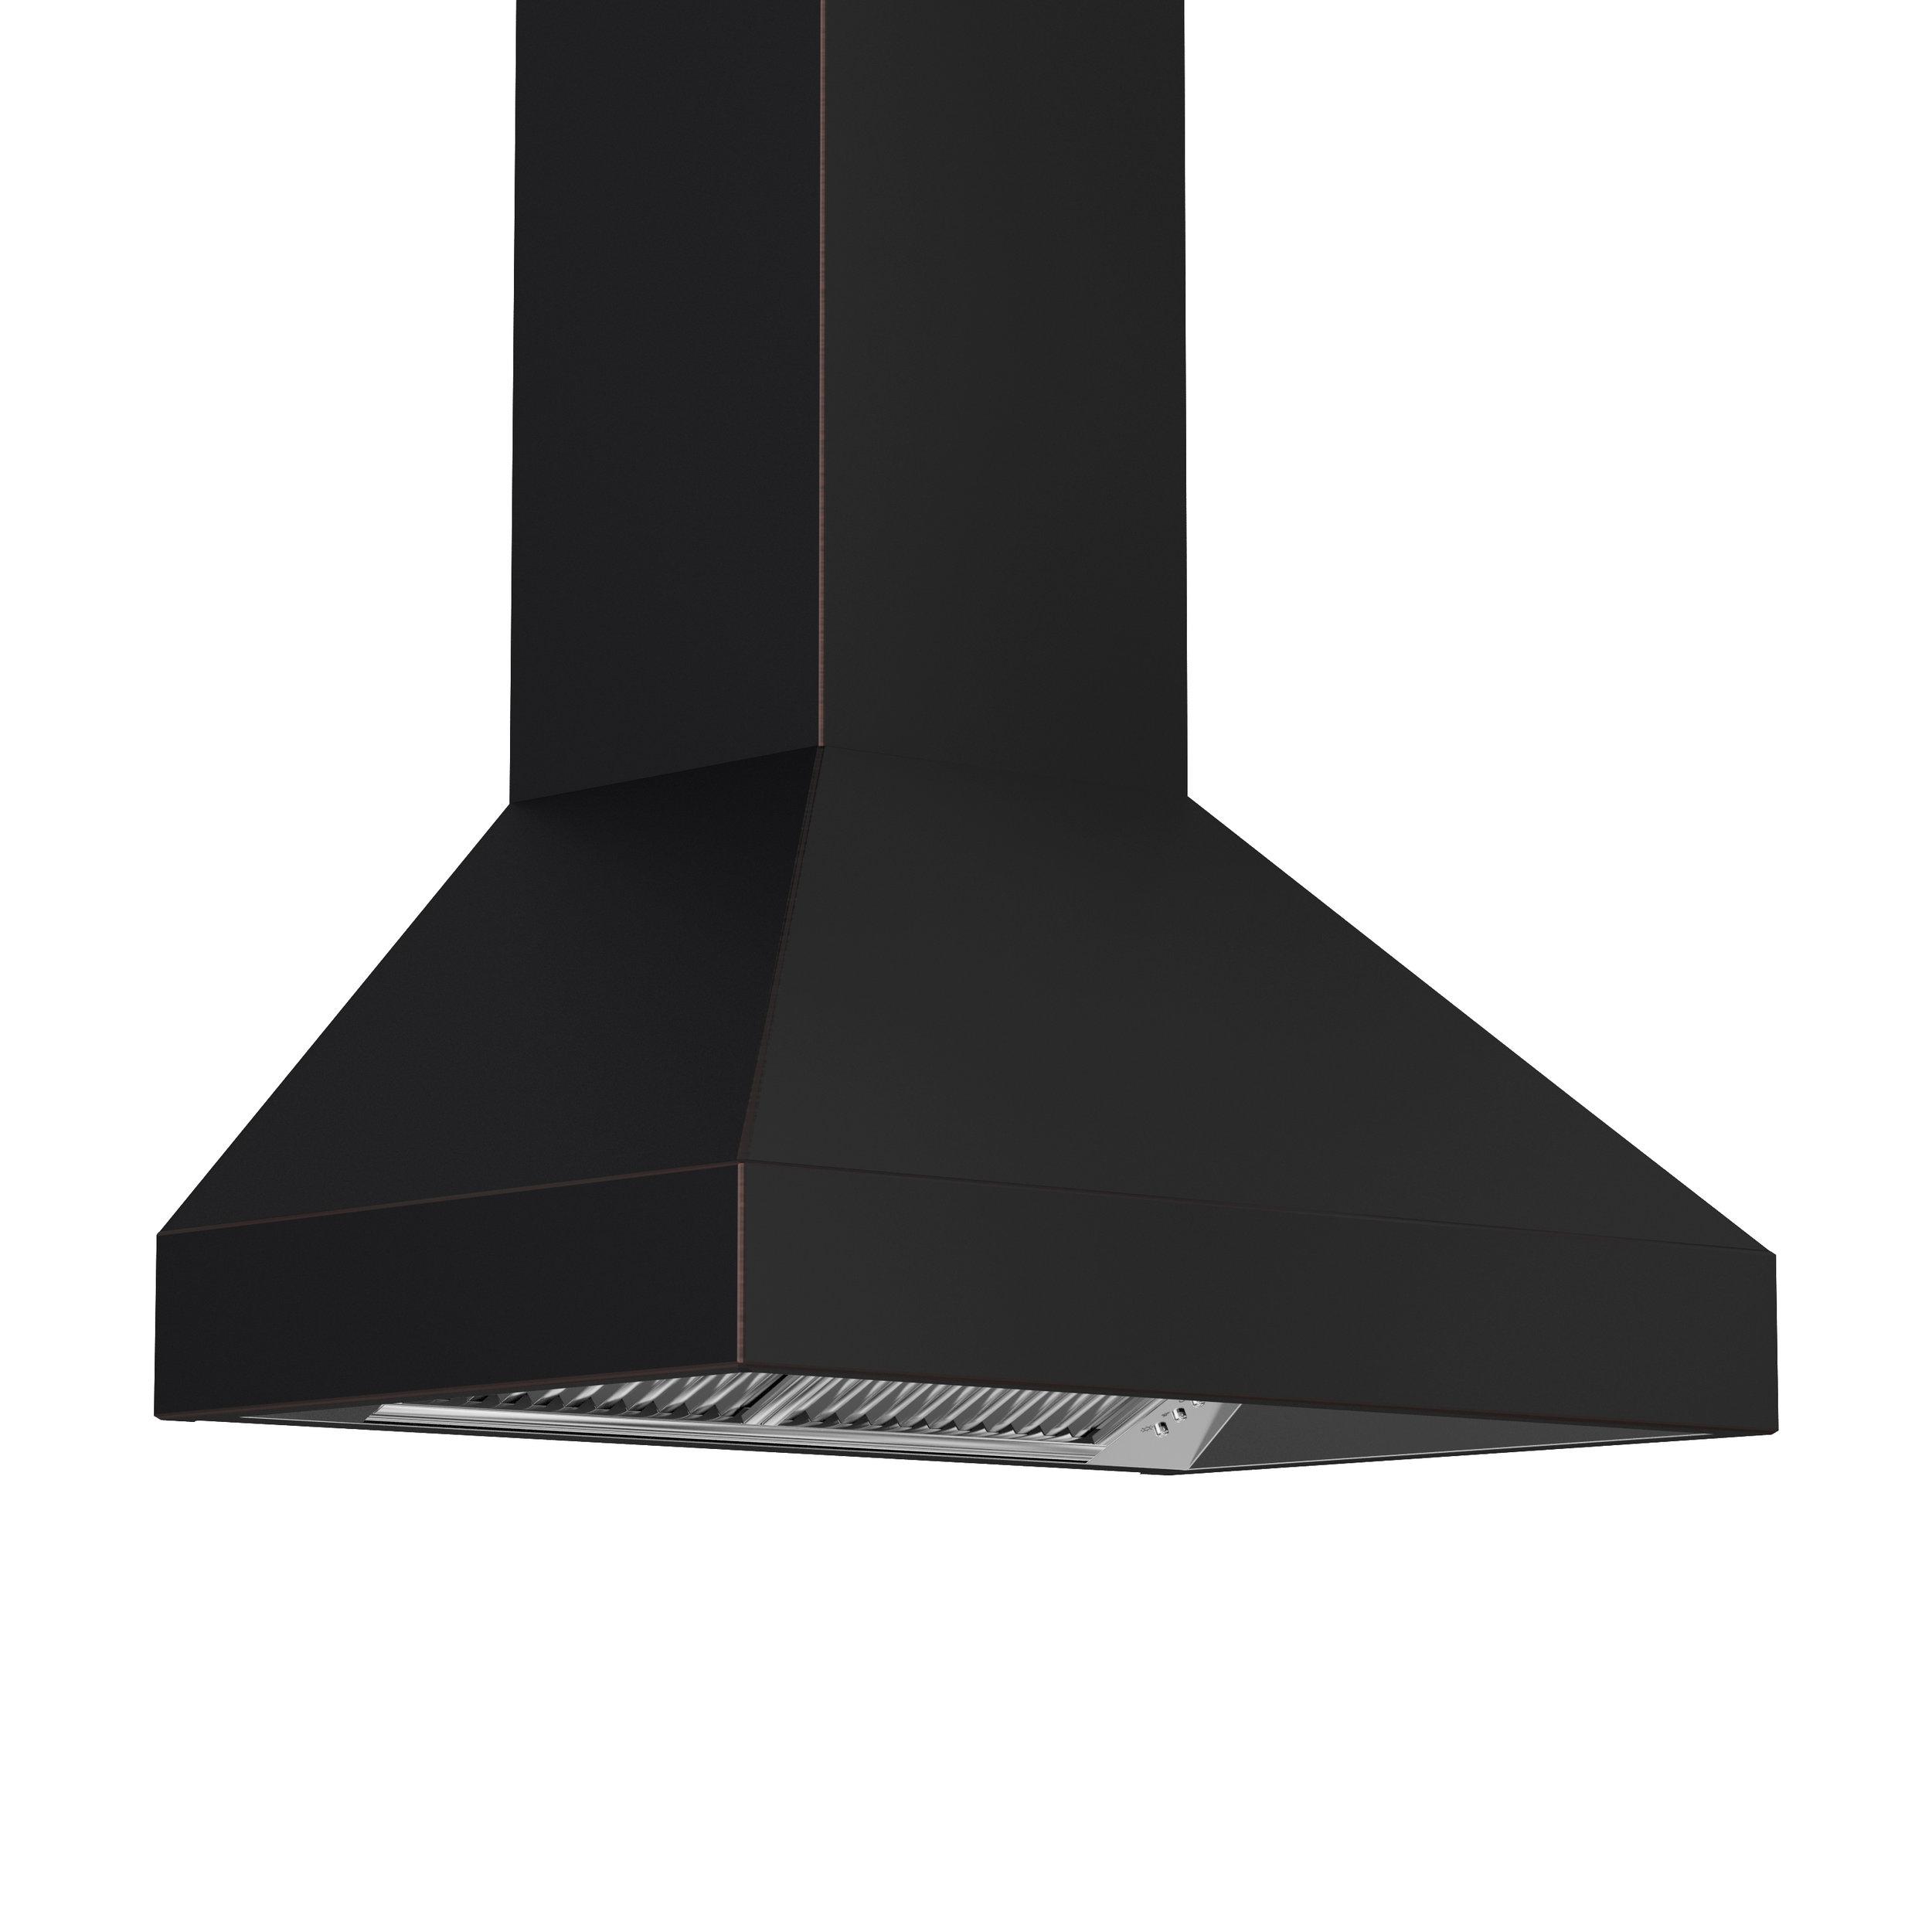 zline-copper-wall-mounted-range-hood-8667B-main.jpg